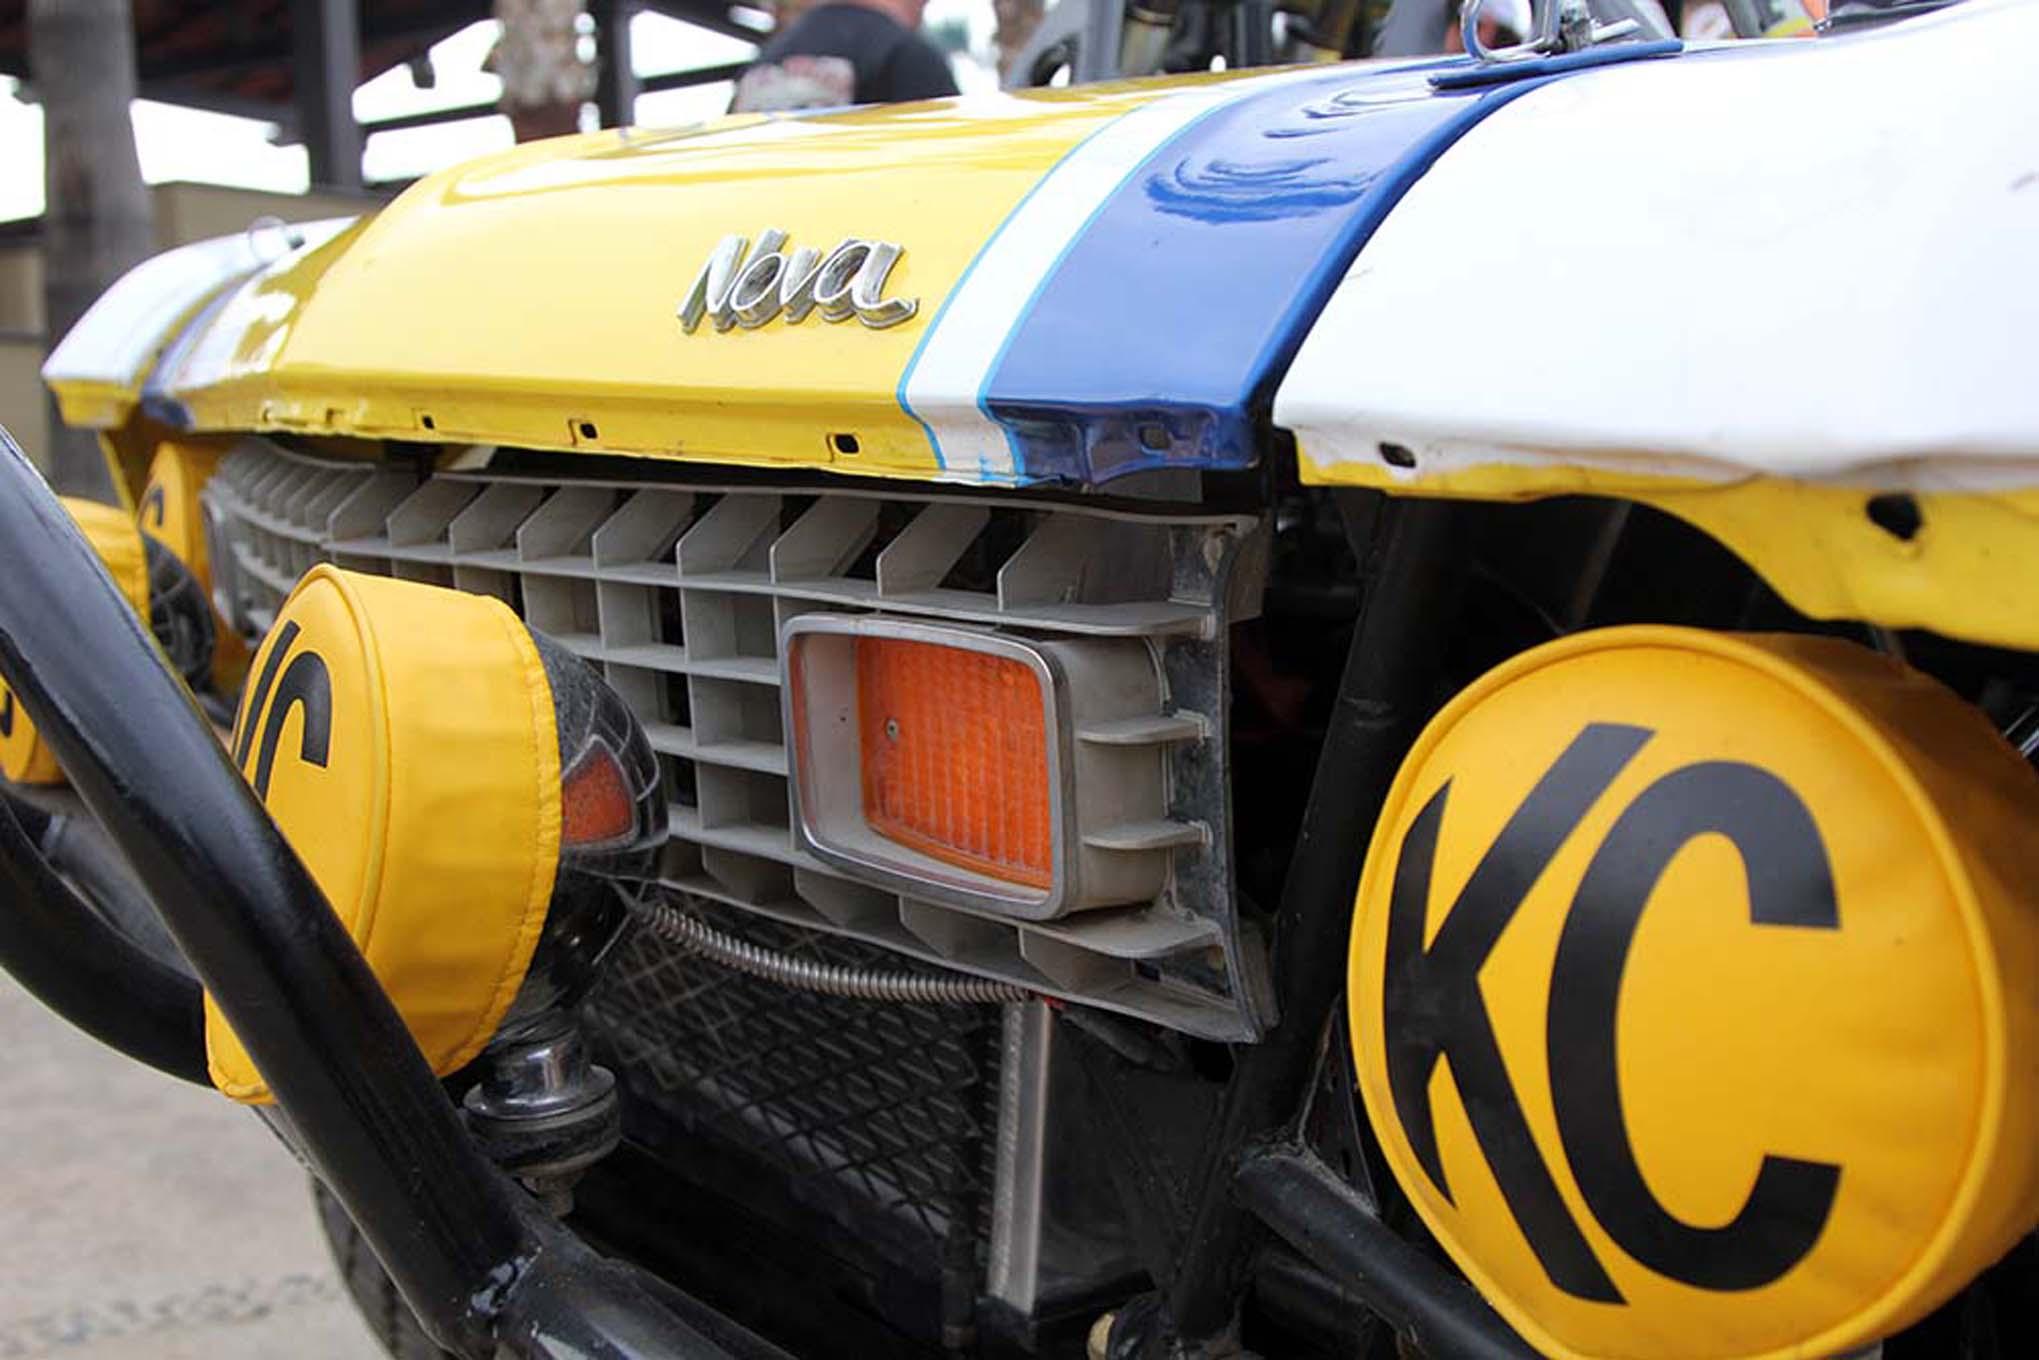 064NORRA Mexican 1000 BAJA offroad Race 2015 Manx Nova Chevy James Garner